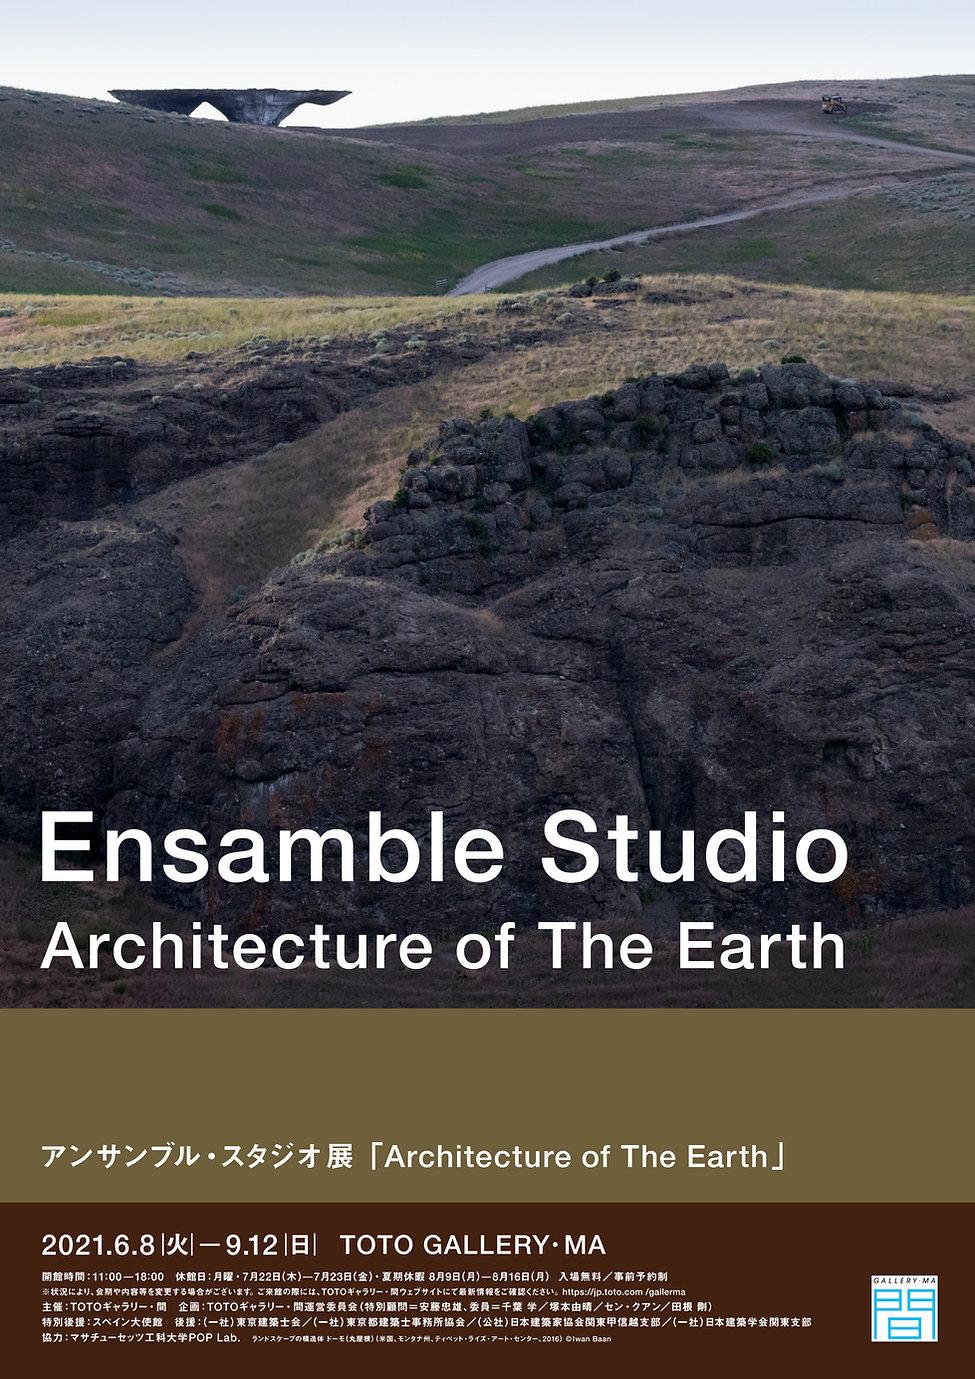 ensamble_studio_A4_front_B_0212.jpg